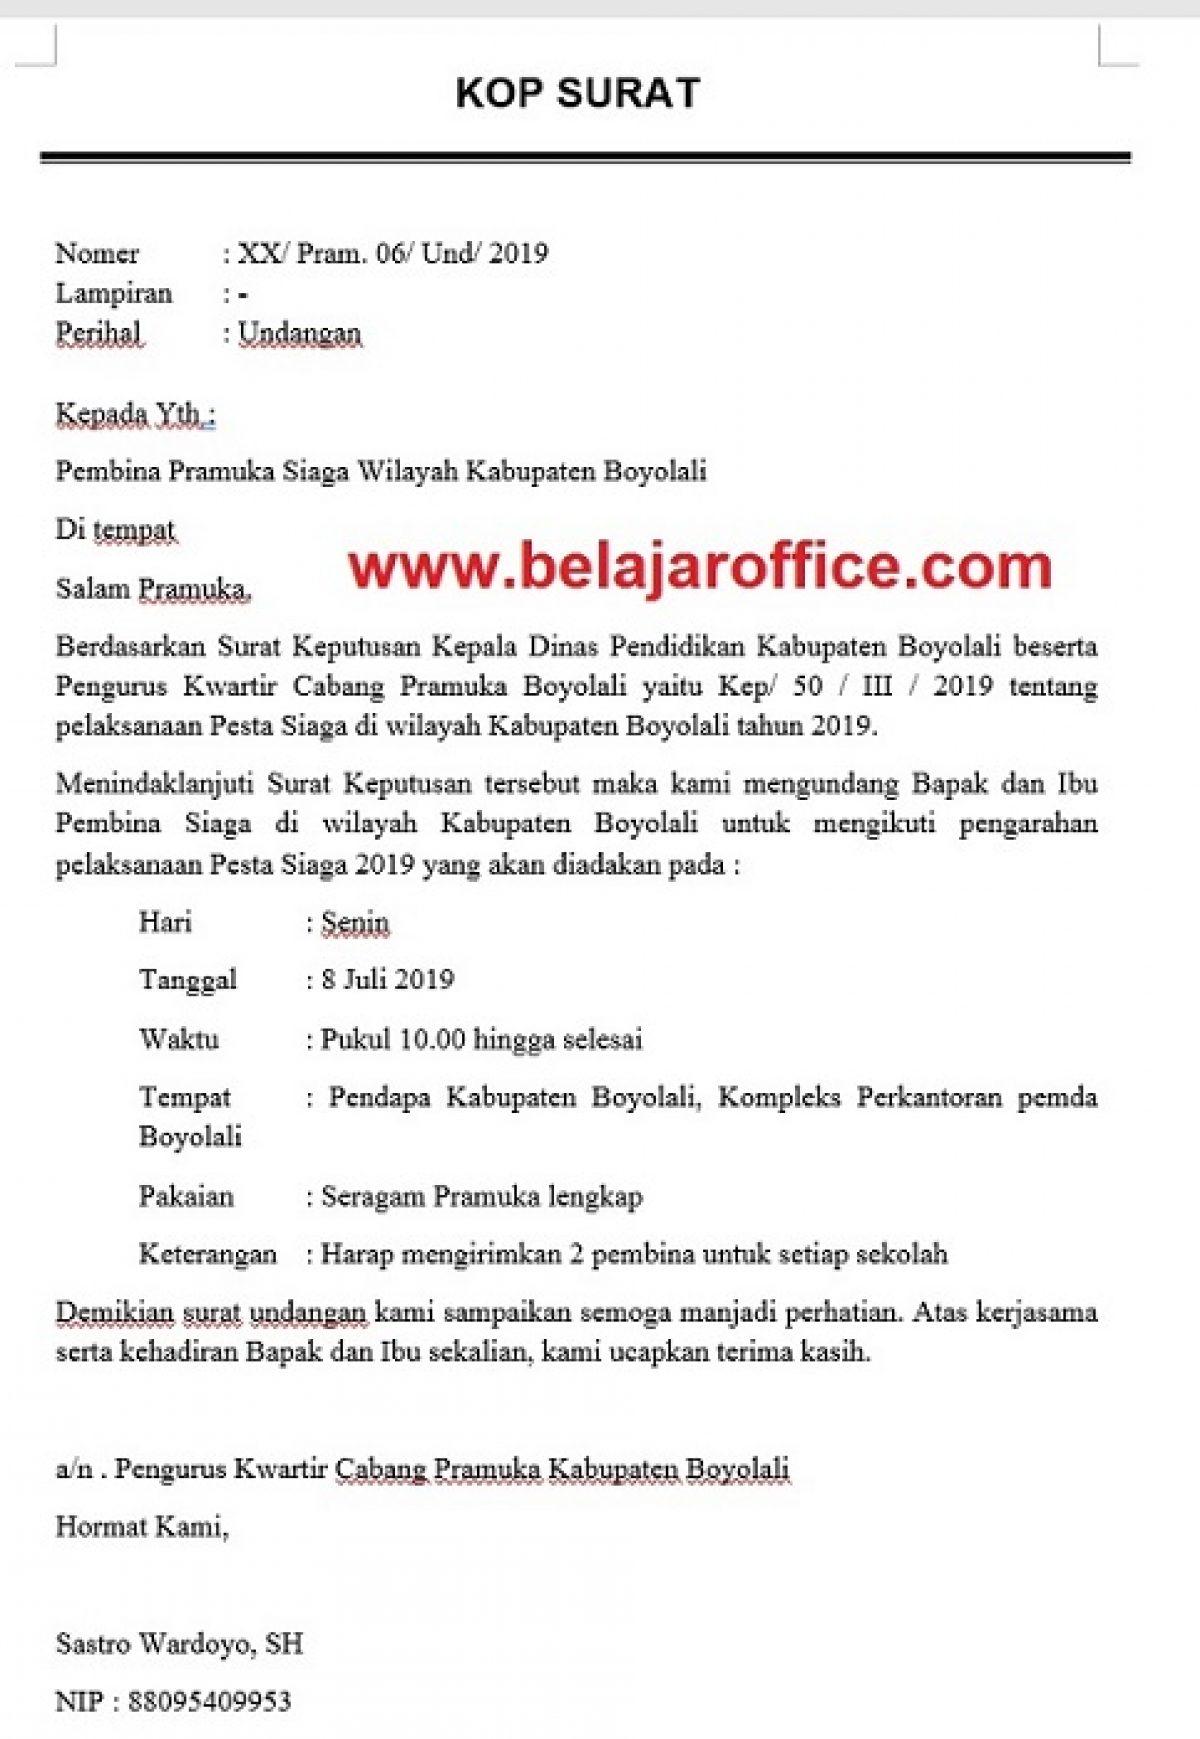 Contoh Surat Undangan Resmi Organisasi Pramuka Belajar Office